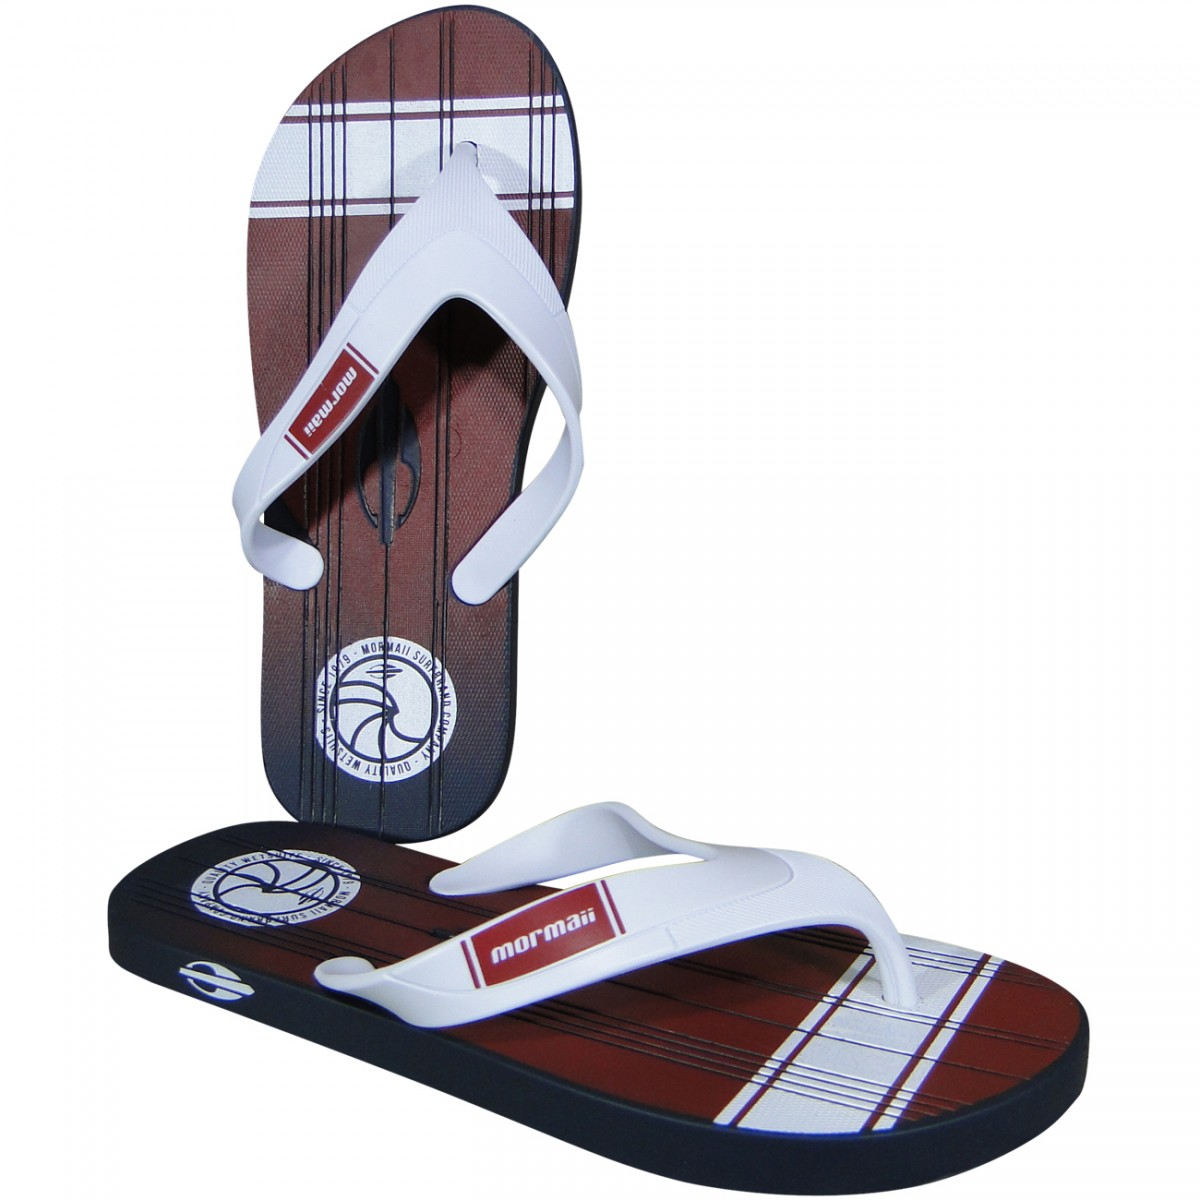 752e07deb3 Chinelo Mormaii Tropical Pro 11060 11060 - 24414 - Azul Branco Bordo -  Chuteira Nike